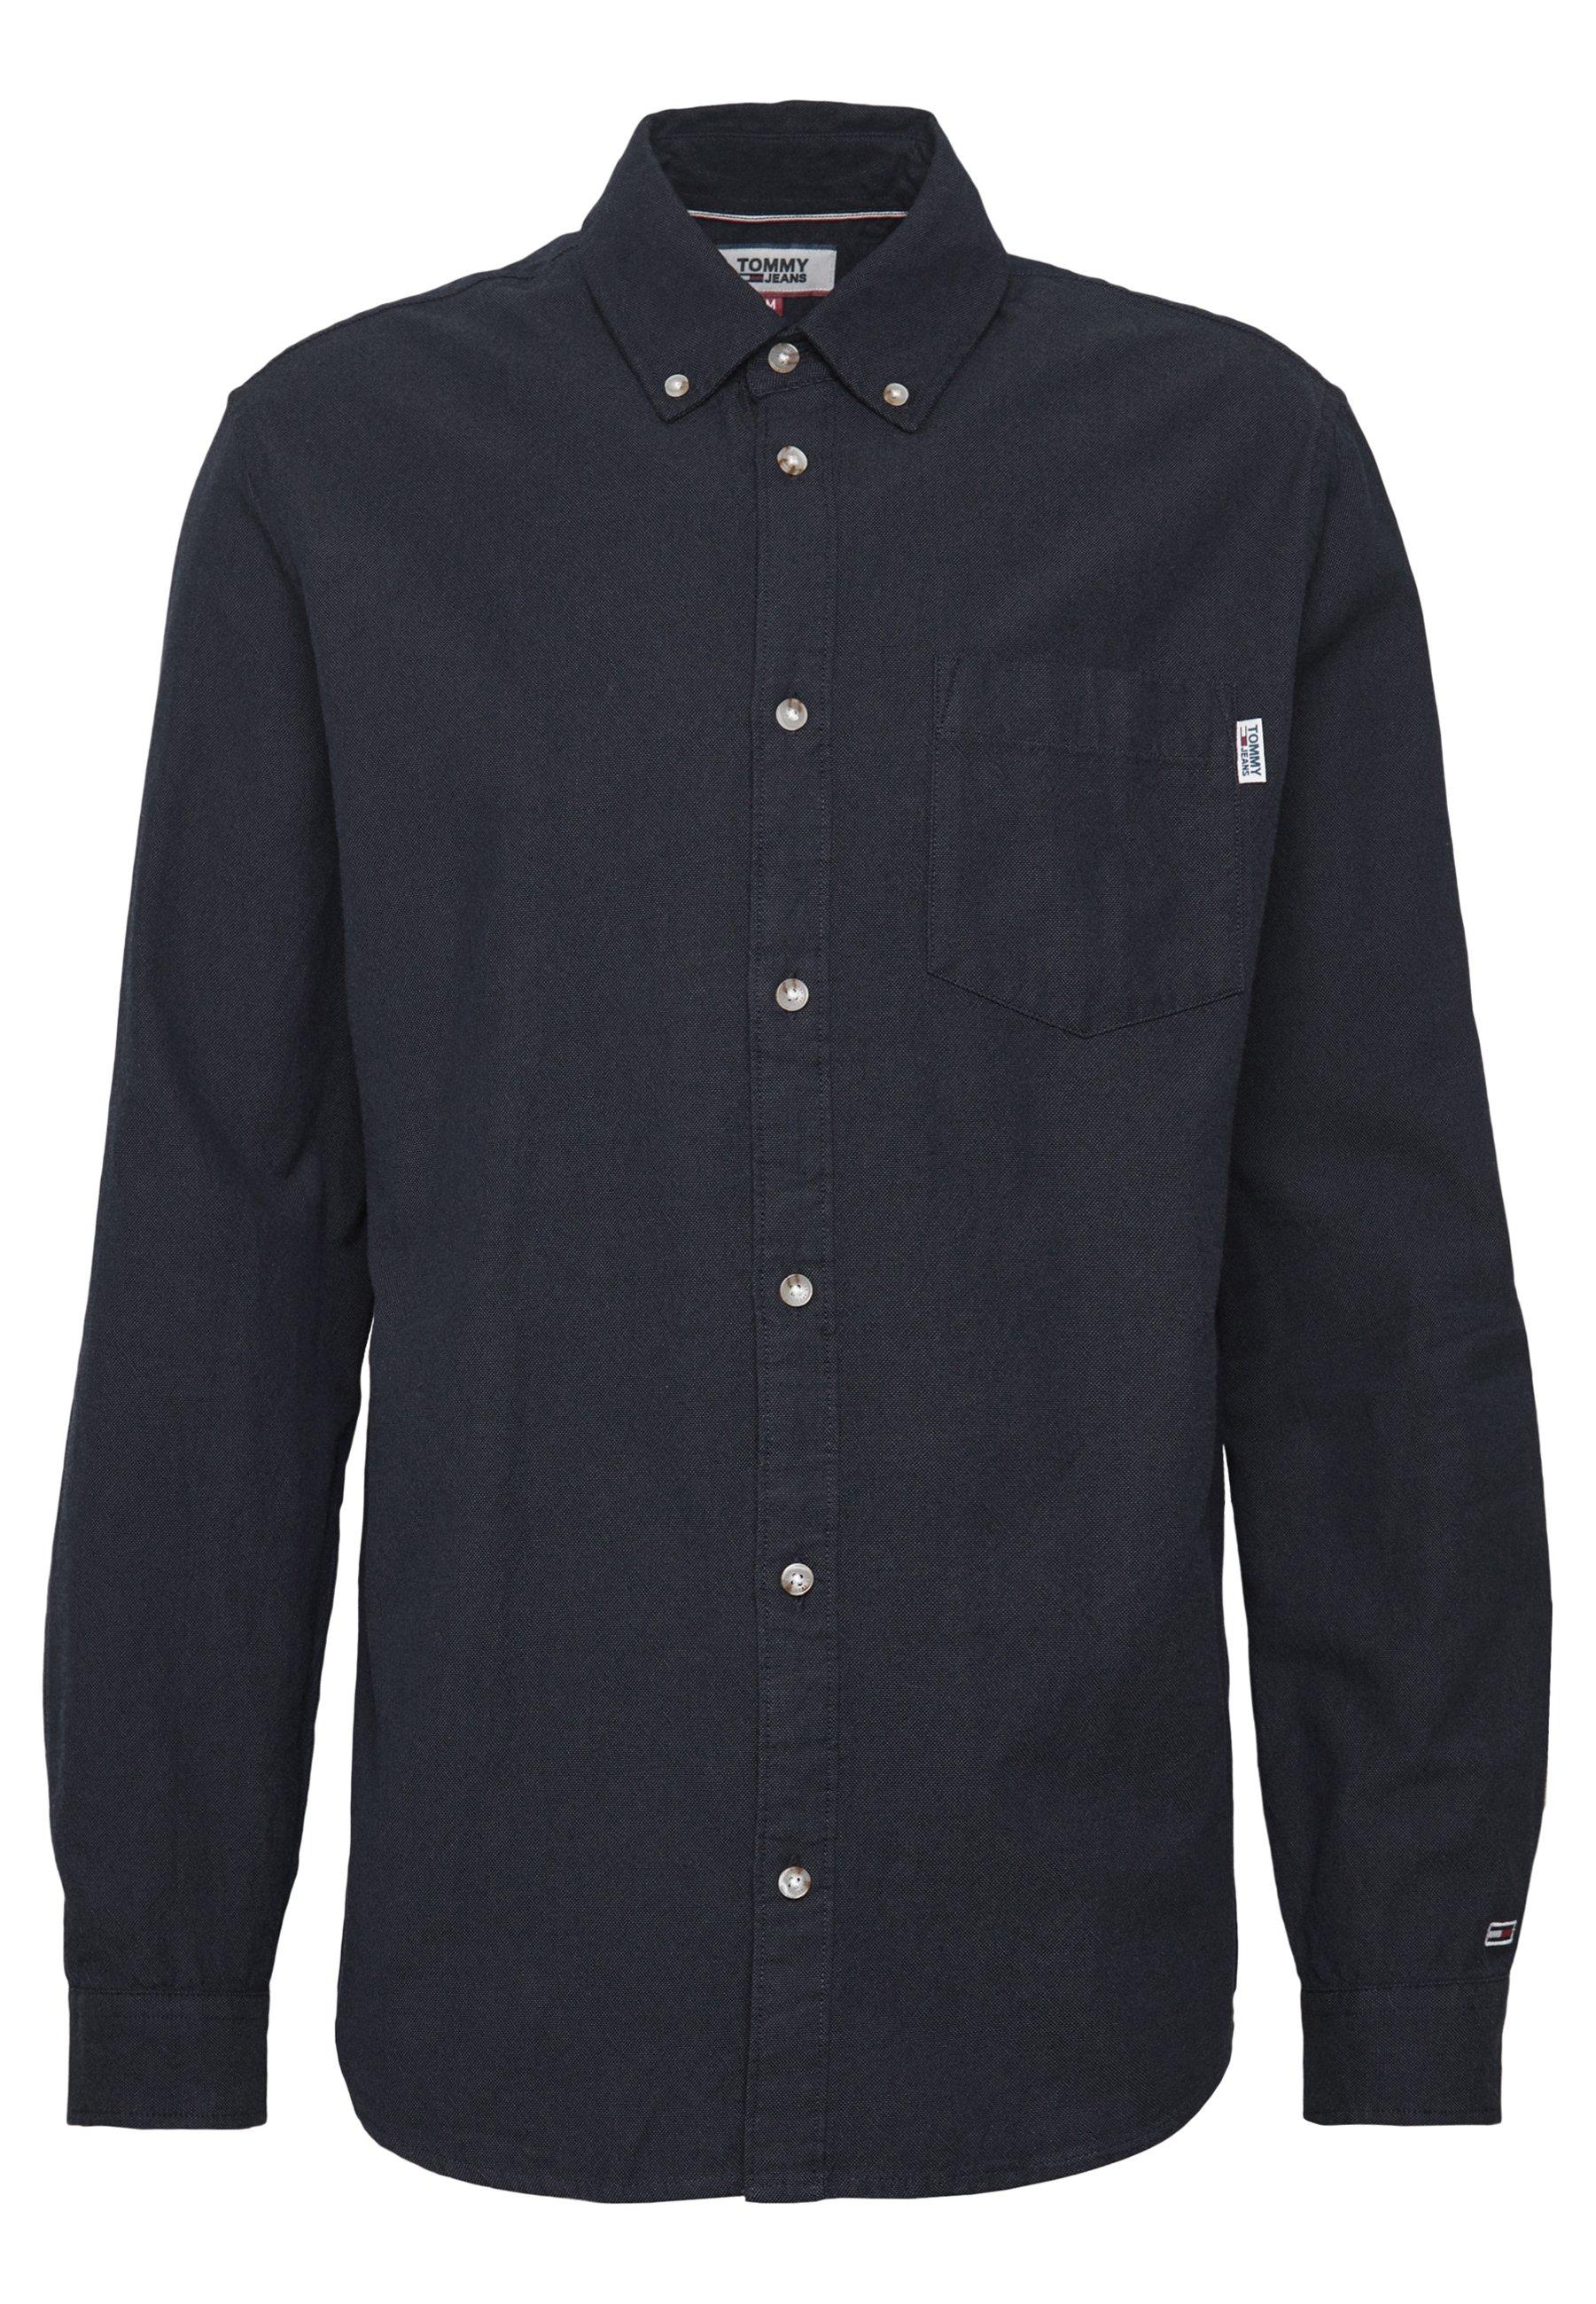 Tommy Jeans Overhemd - Black Iris